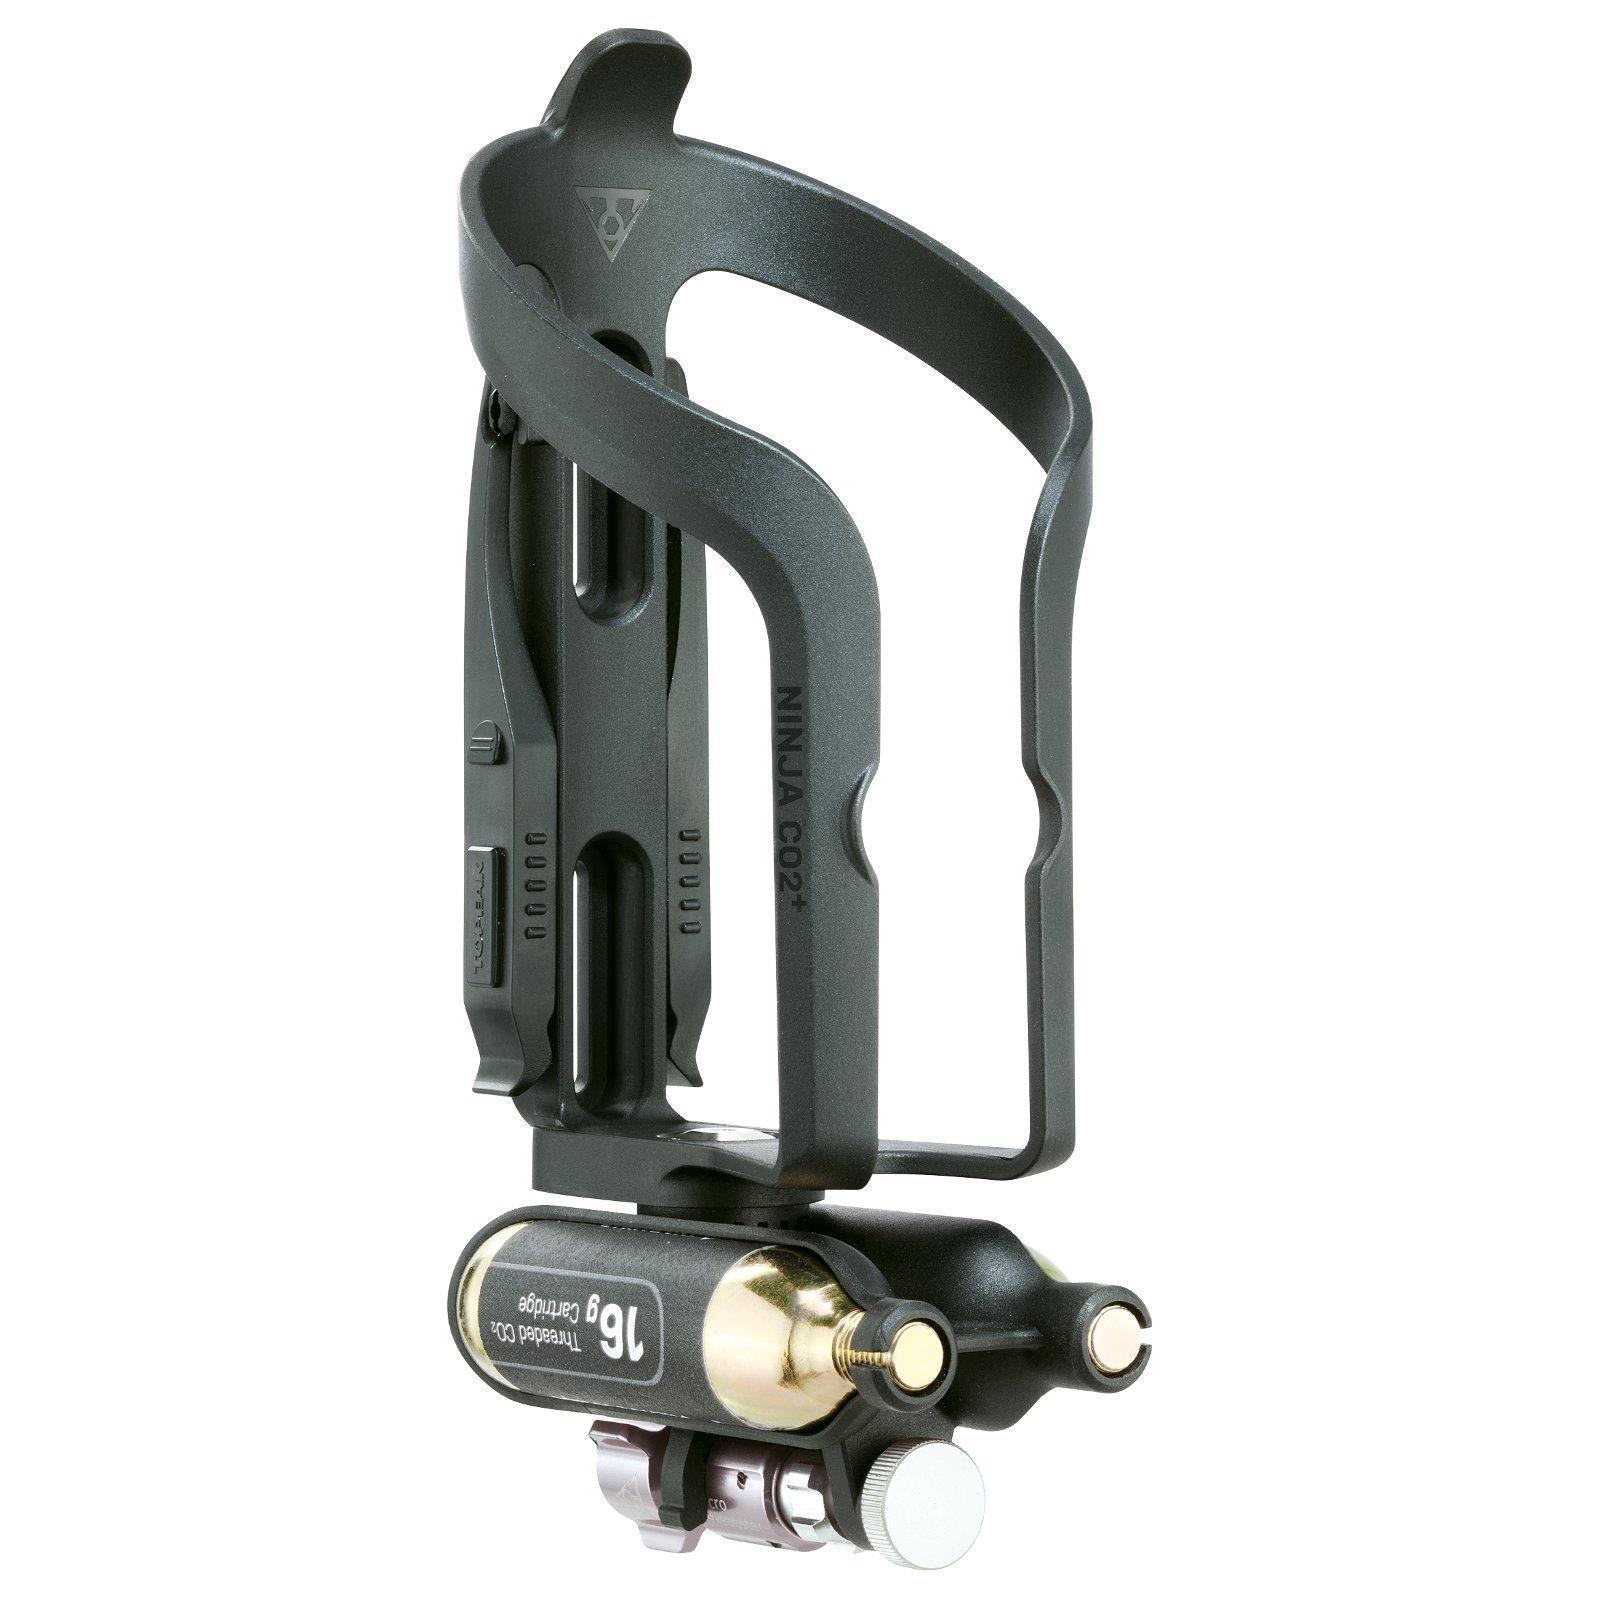 Topeak Ninja CO2 Plus Fahrrad Flaschenhalter Pumpe Micro Air Booster Kartusche